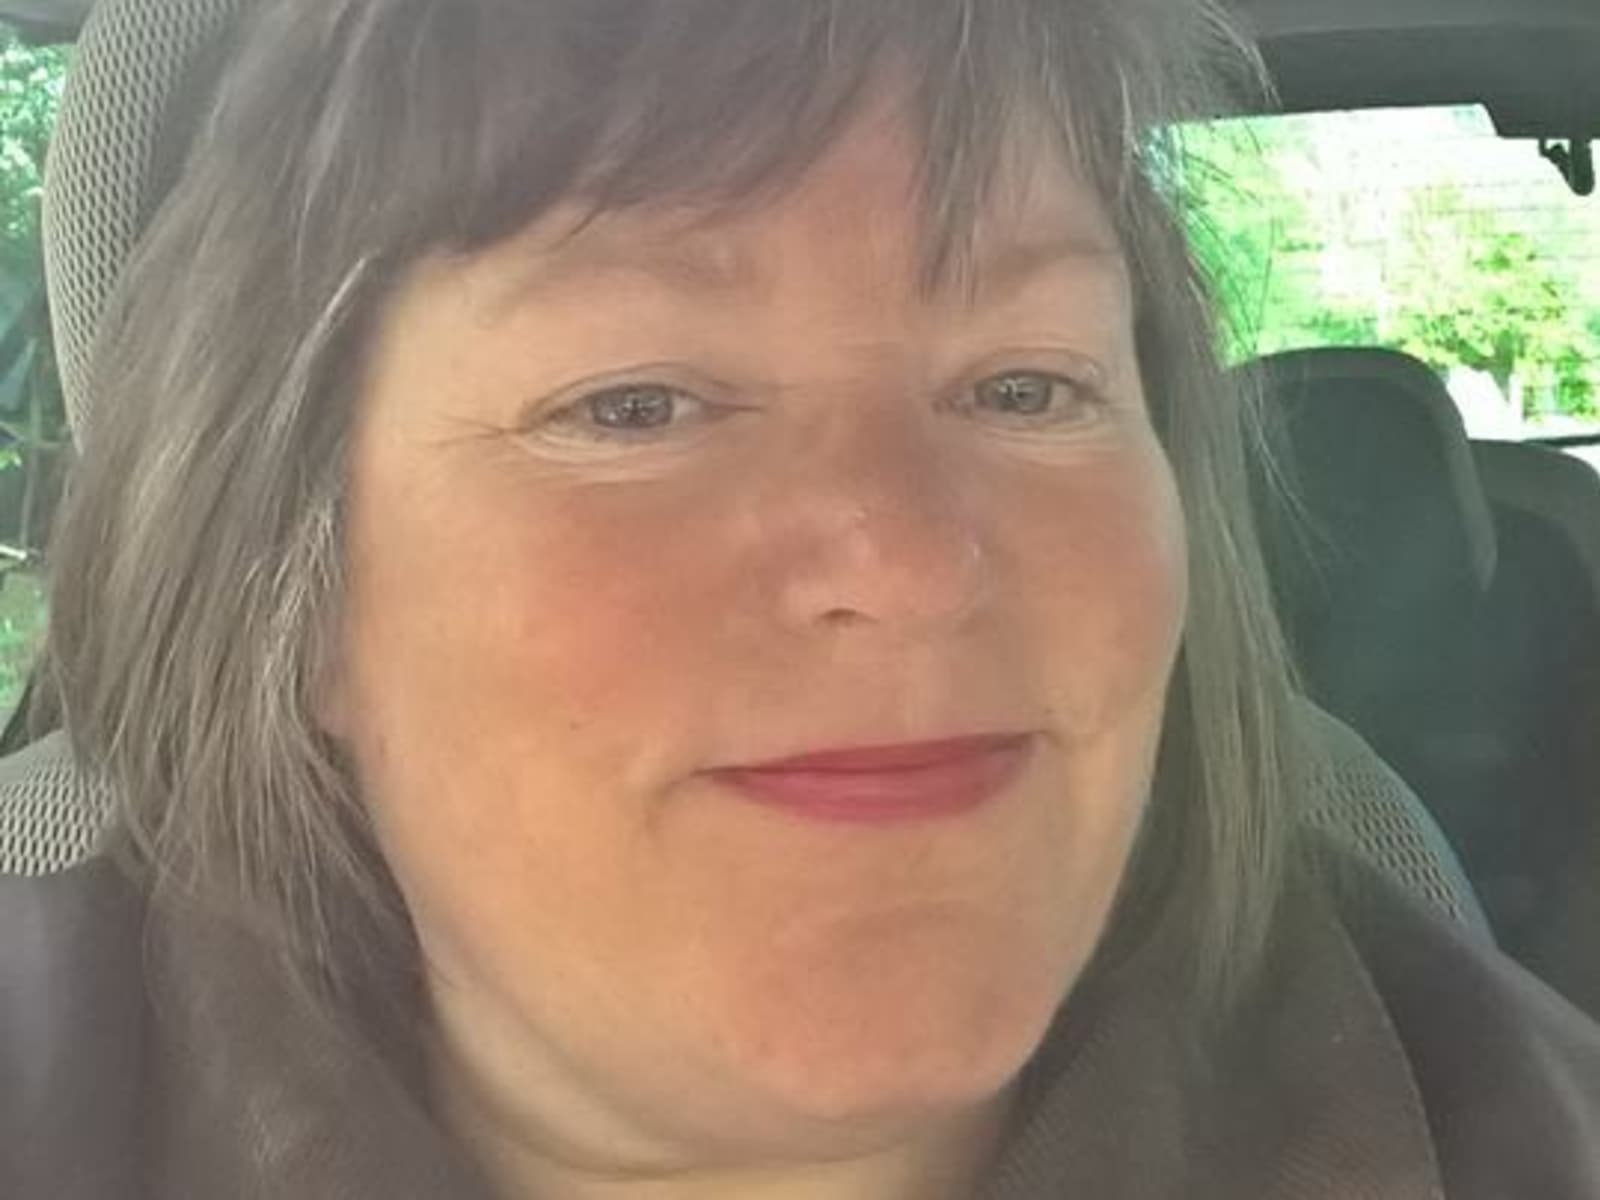 Jane from Cambridge, United Kingdom